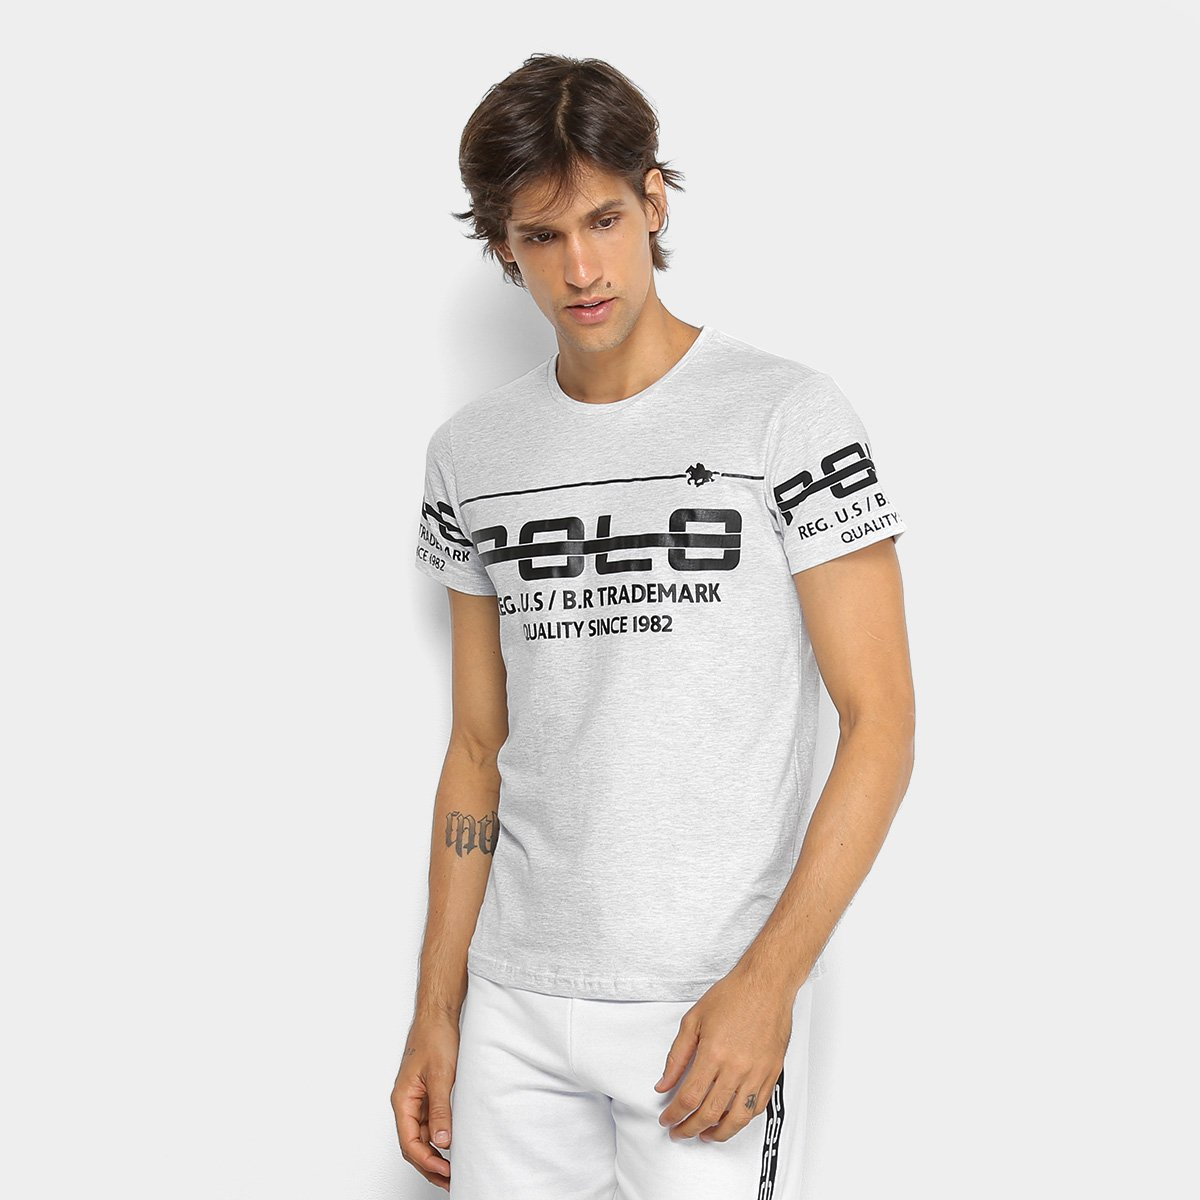 Foto 1 - Camiseta RG 518 Meia Malha Estampada Masculina